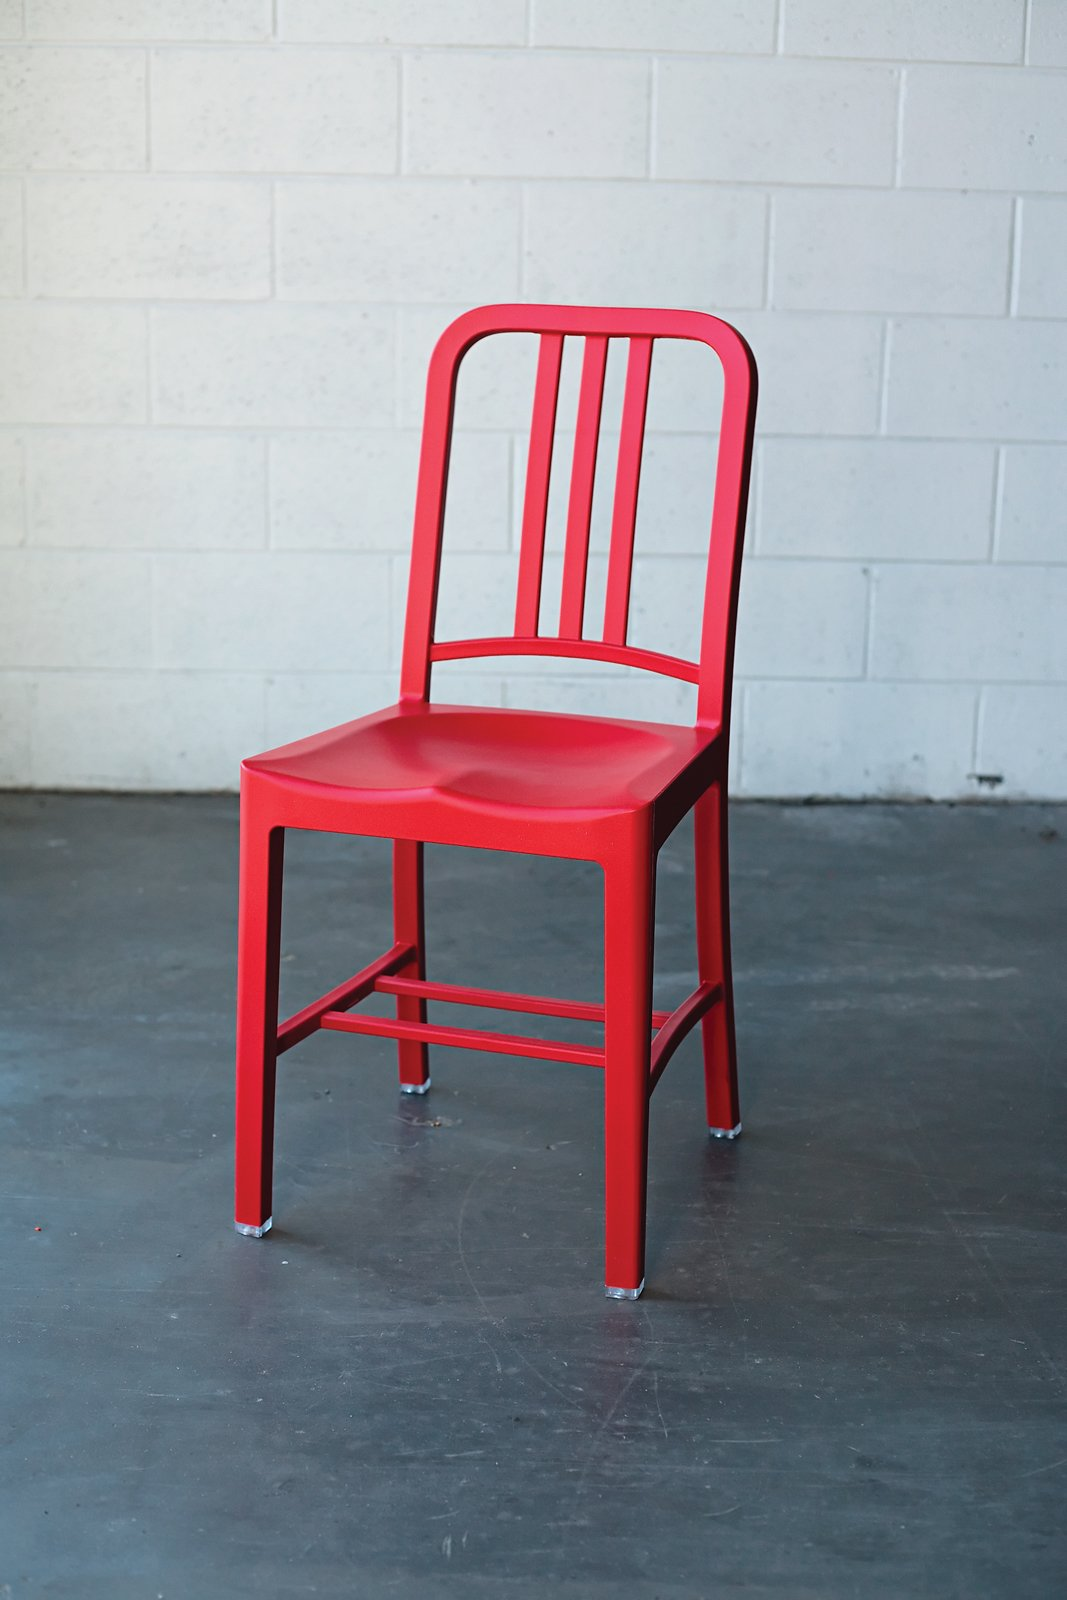 Emecou0027s 111 Navy Chair